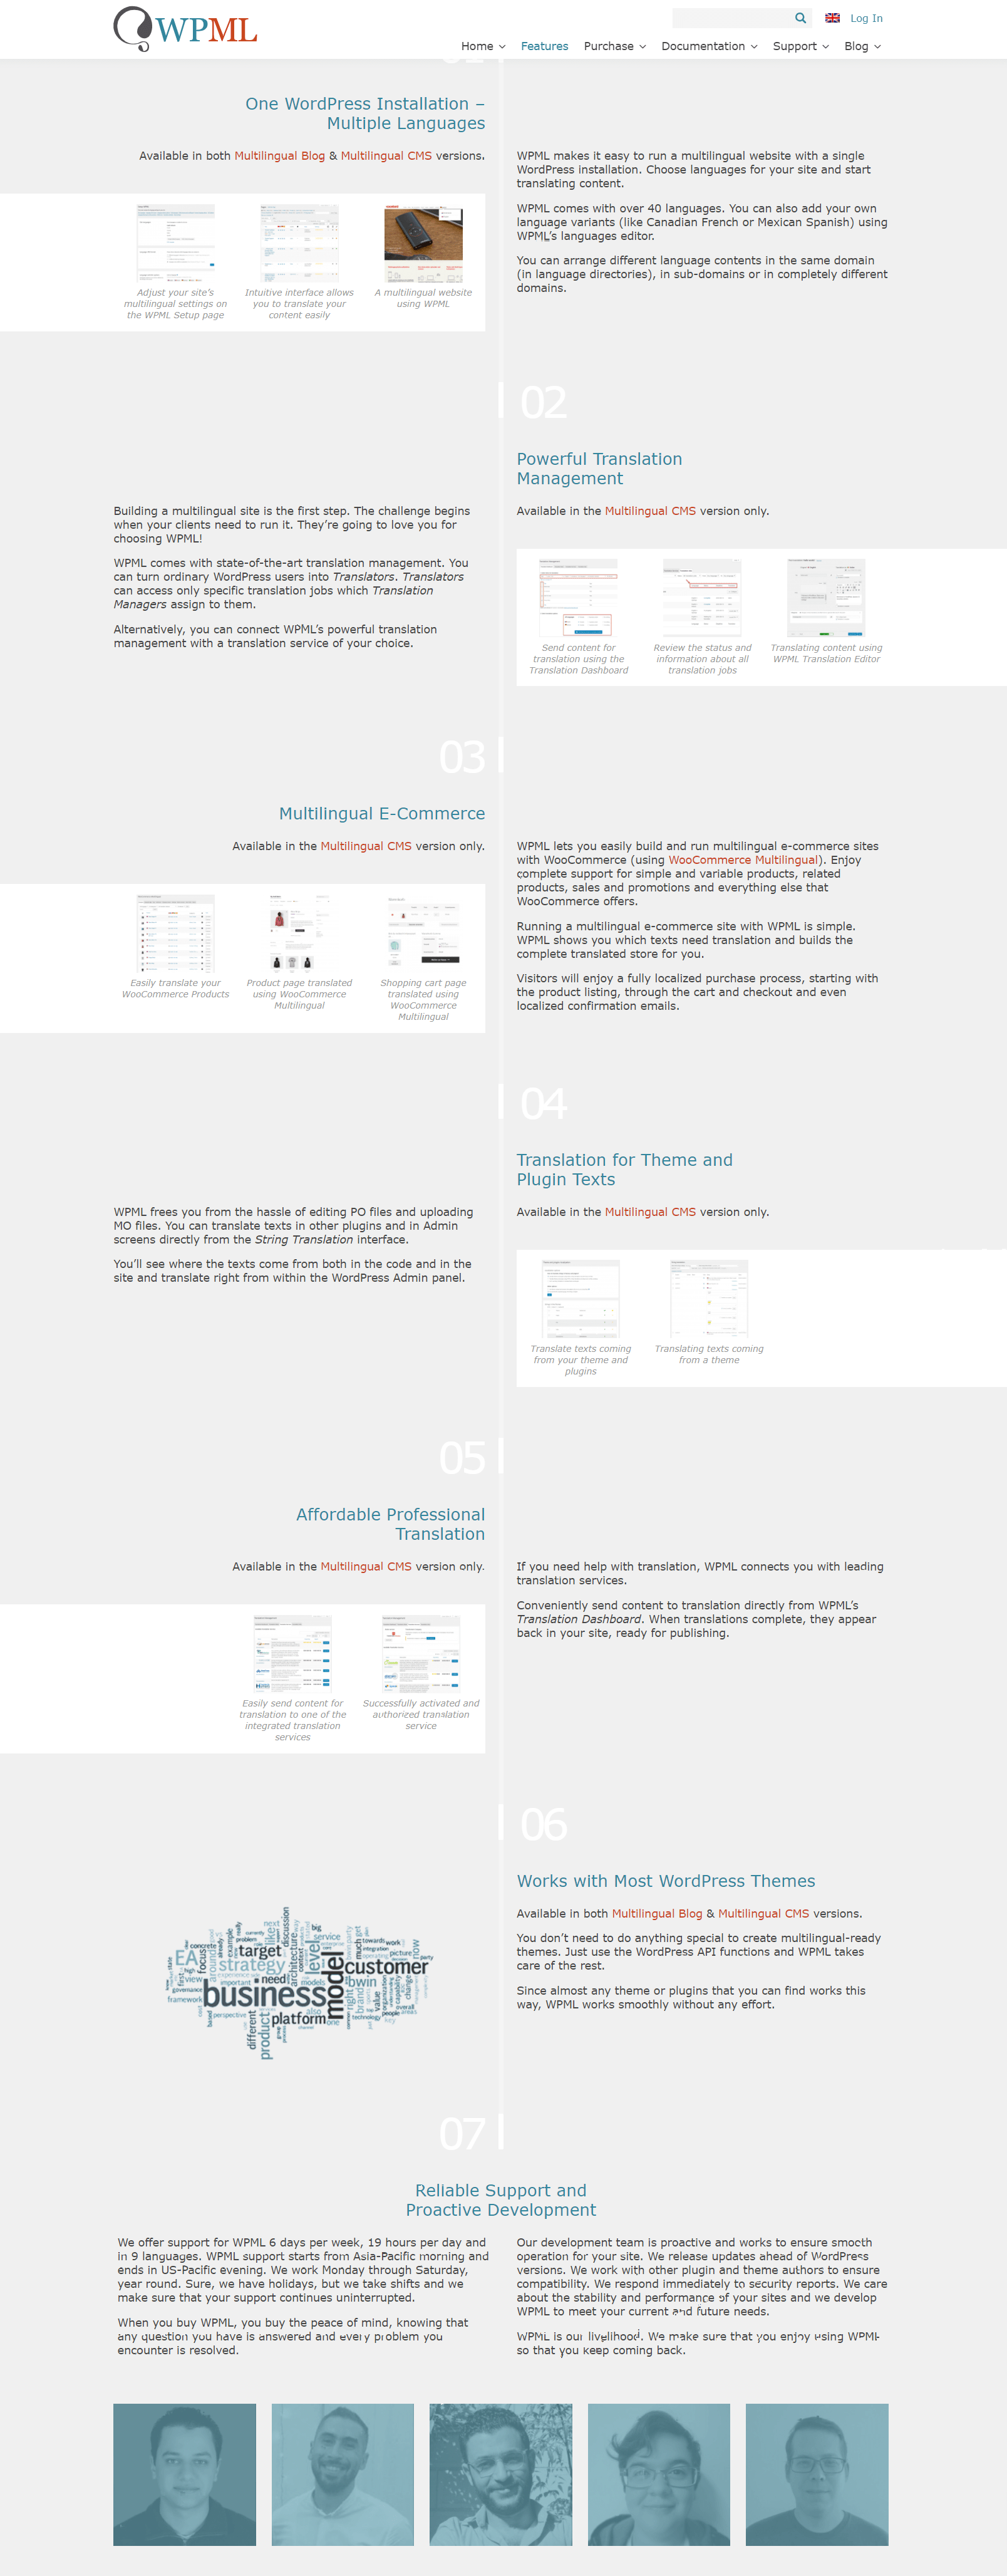 WPML Features - Weglot vs WPML